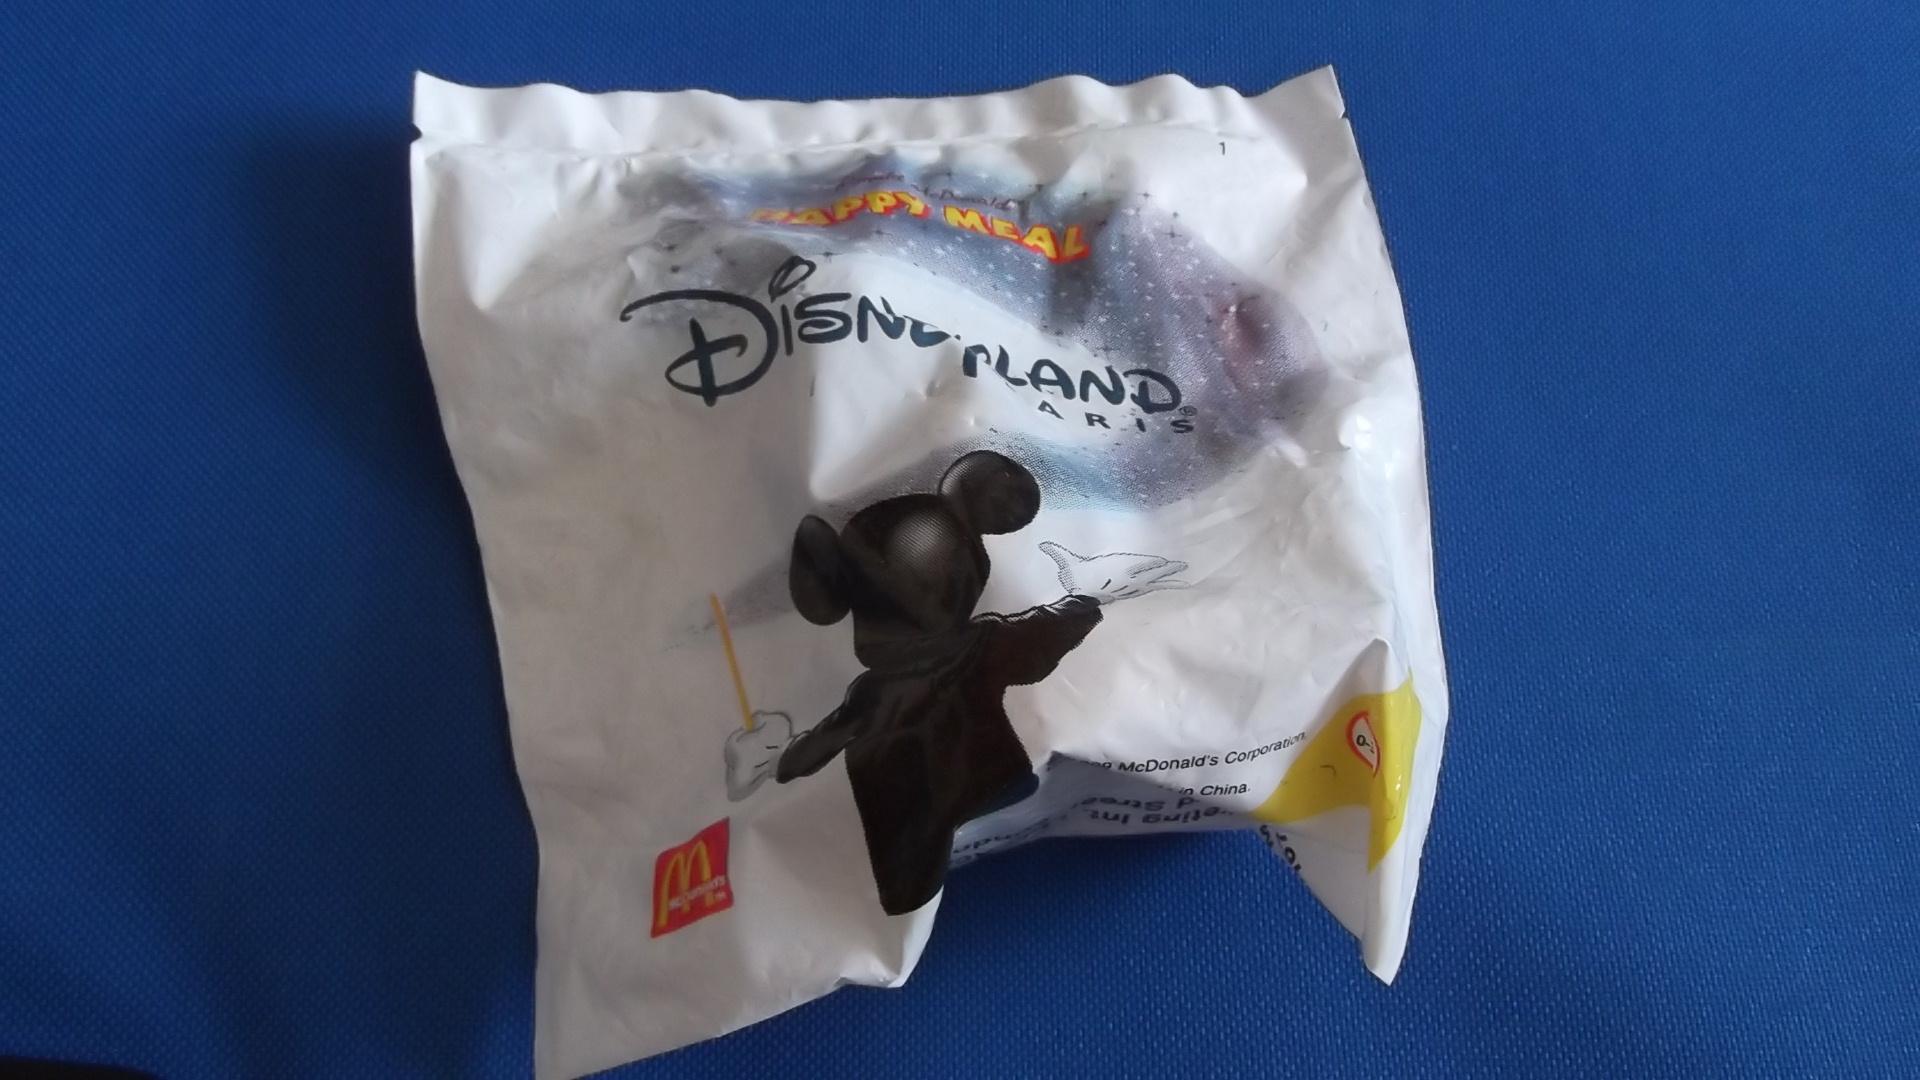 McDonalds Disneyland Paris Train #1 Toy From 1999 New